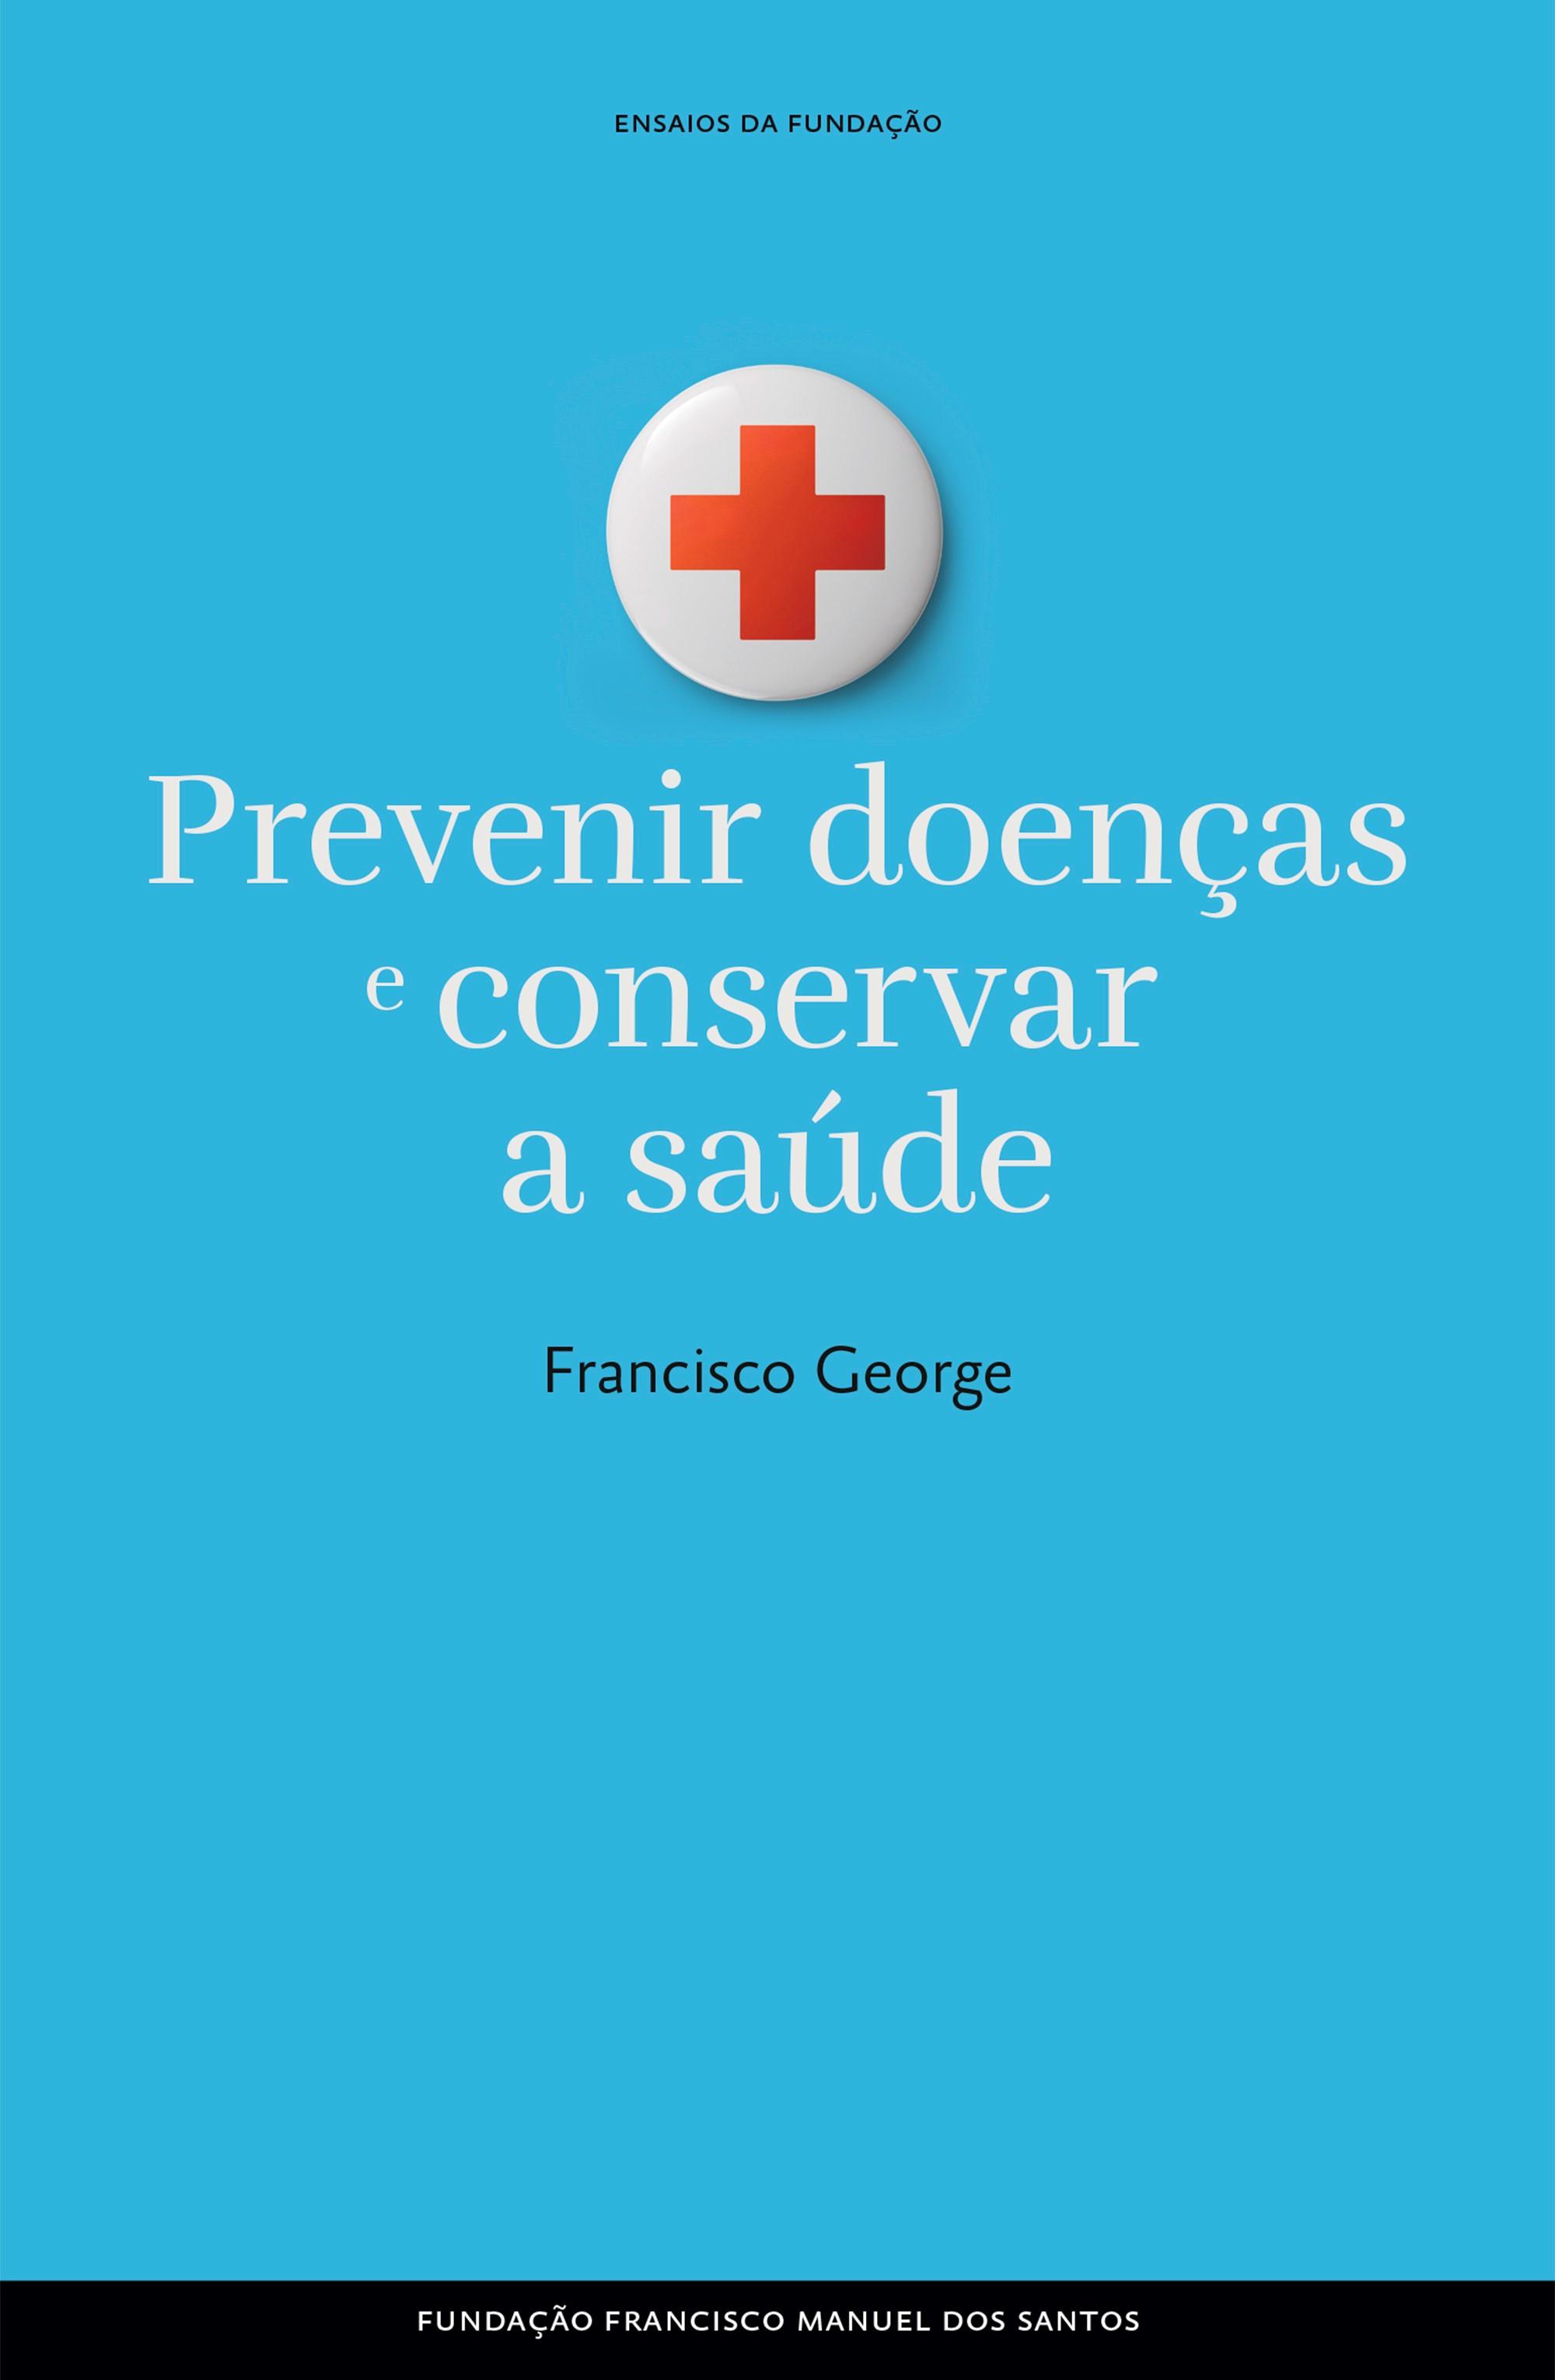 Livro Francisco George